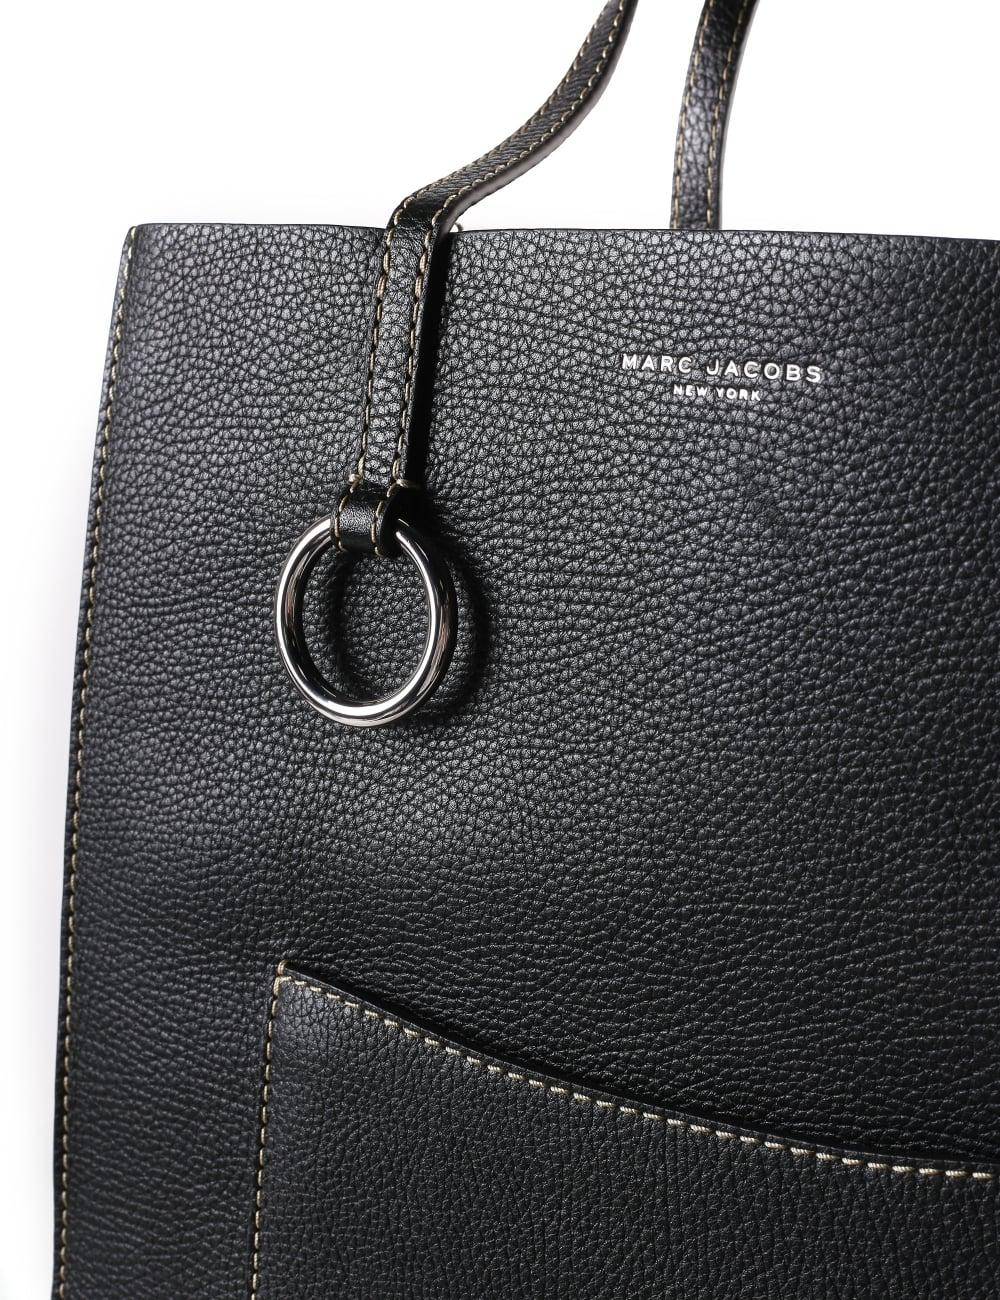 a23466c86a87 Marc Jacobs The Bold Grind Women s Shopper Tote Bag